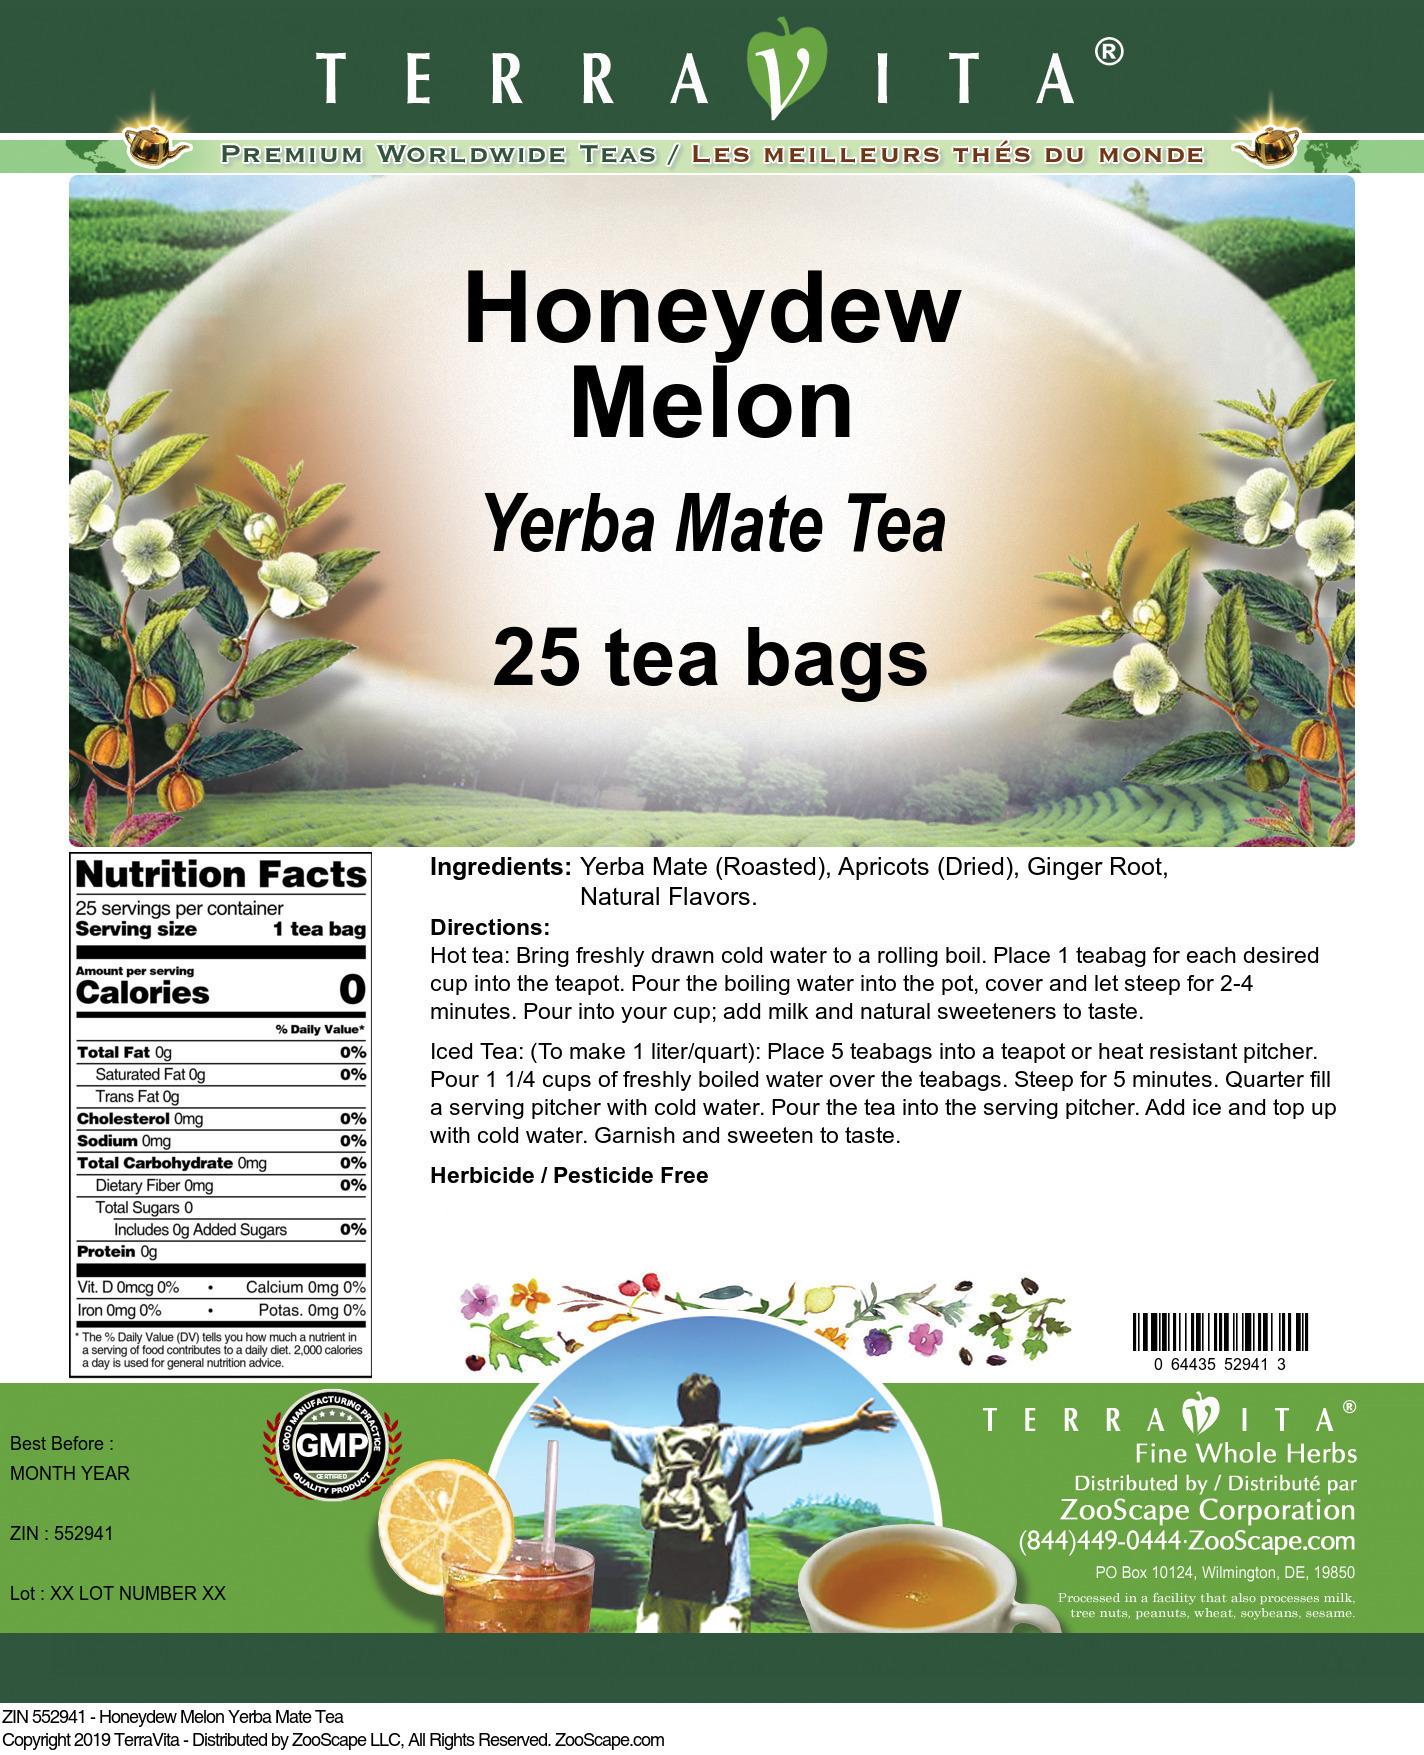 Honeydew Melon Yerba Mate Tea